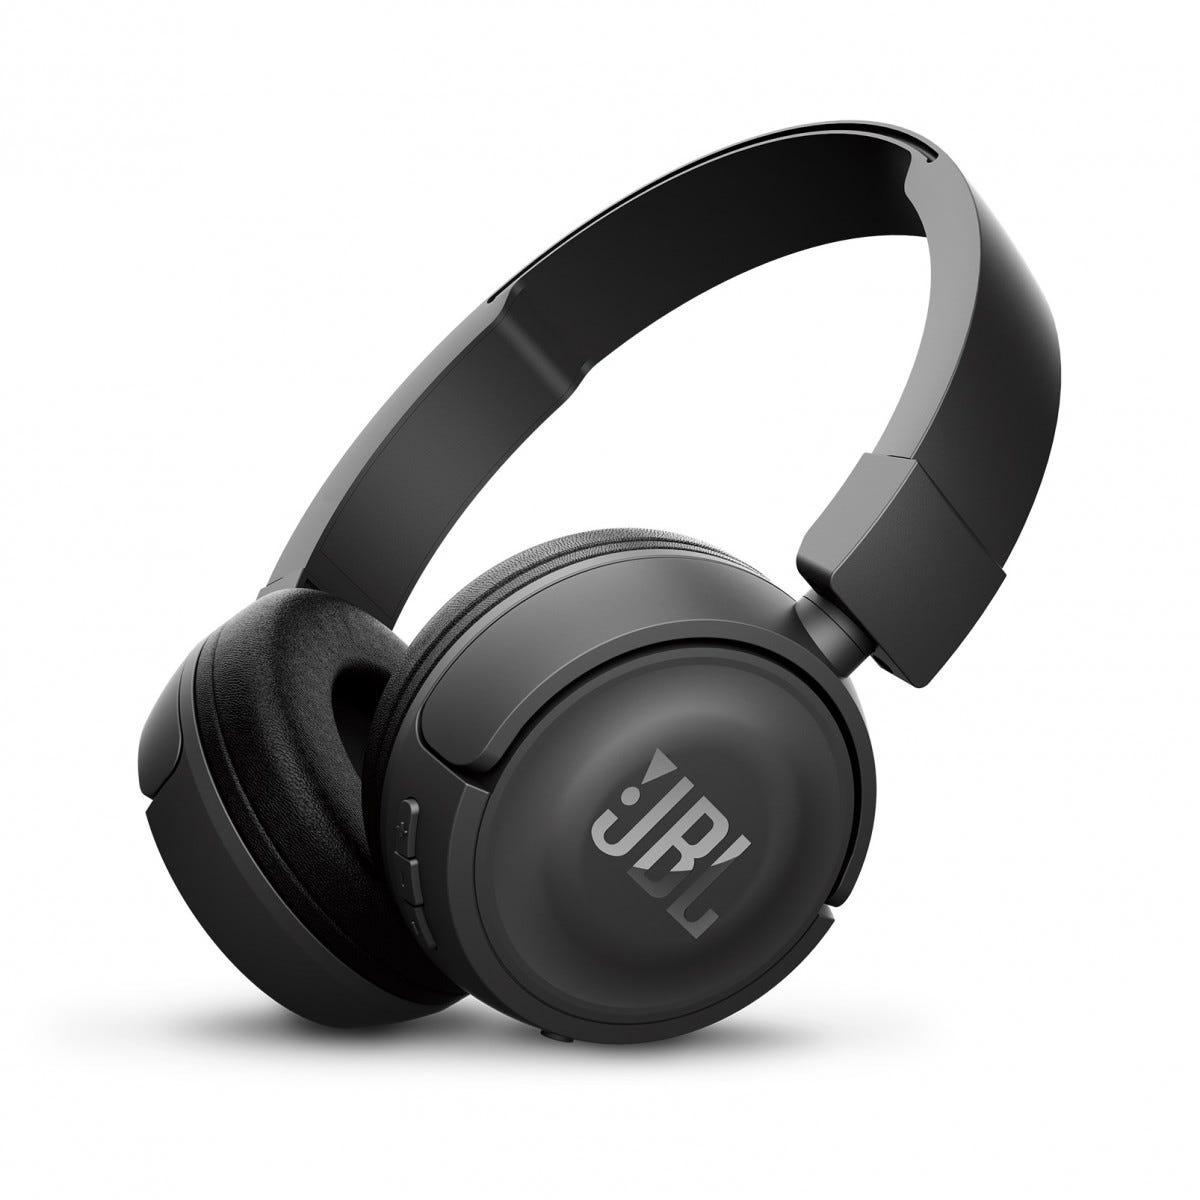 ab8a1904c JBL T450BT trådløse on-ear hodetelefoner - svart